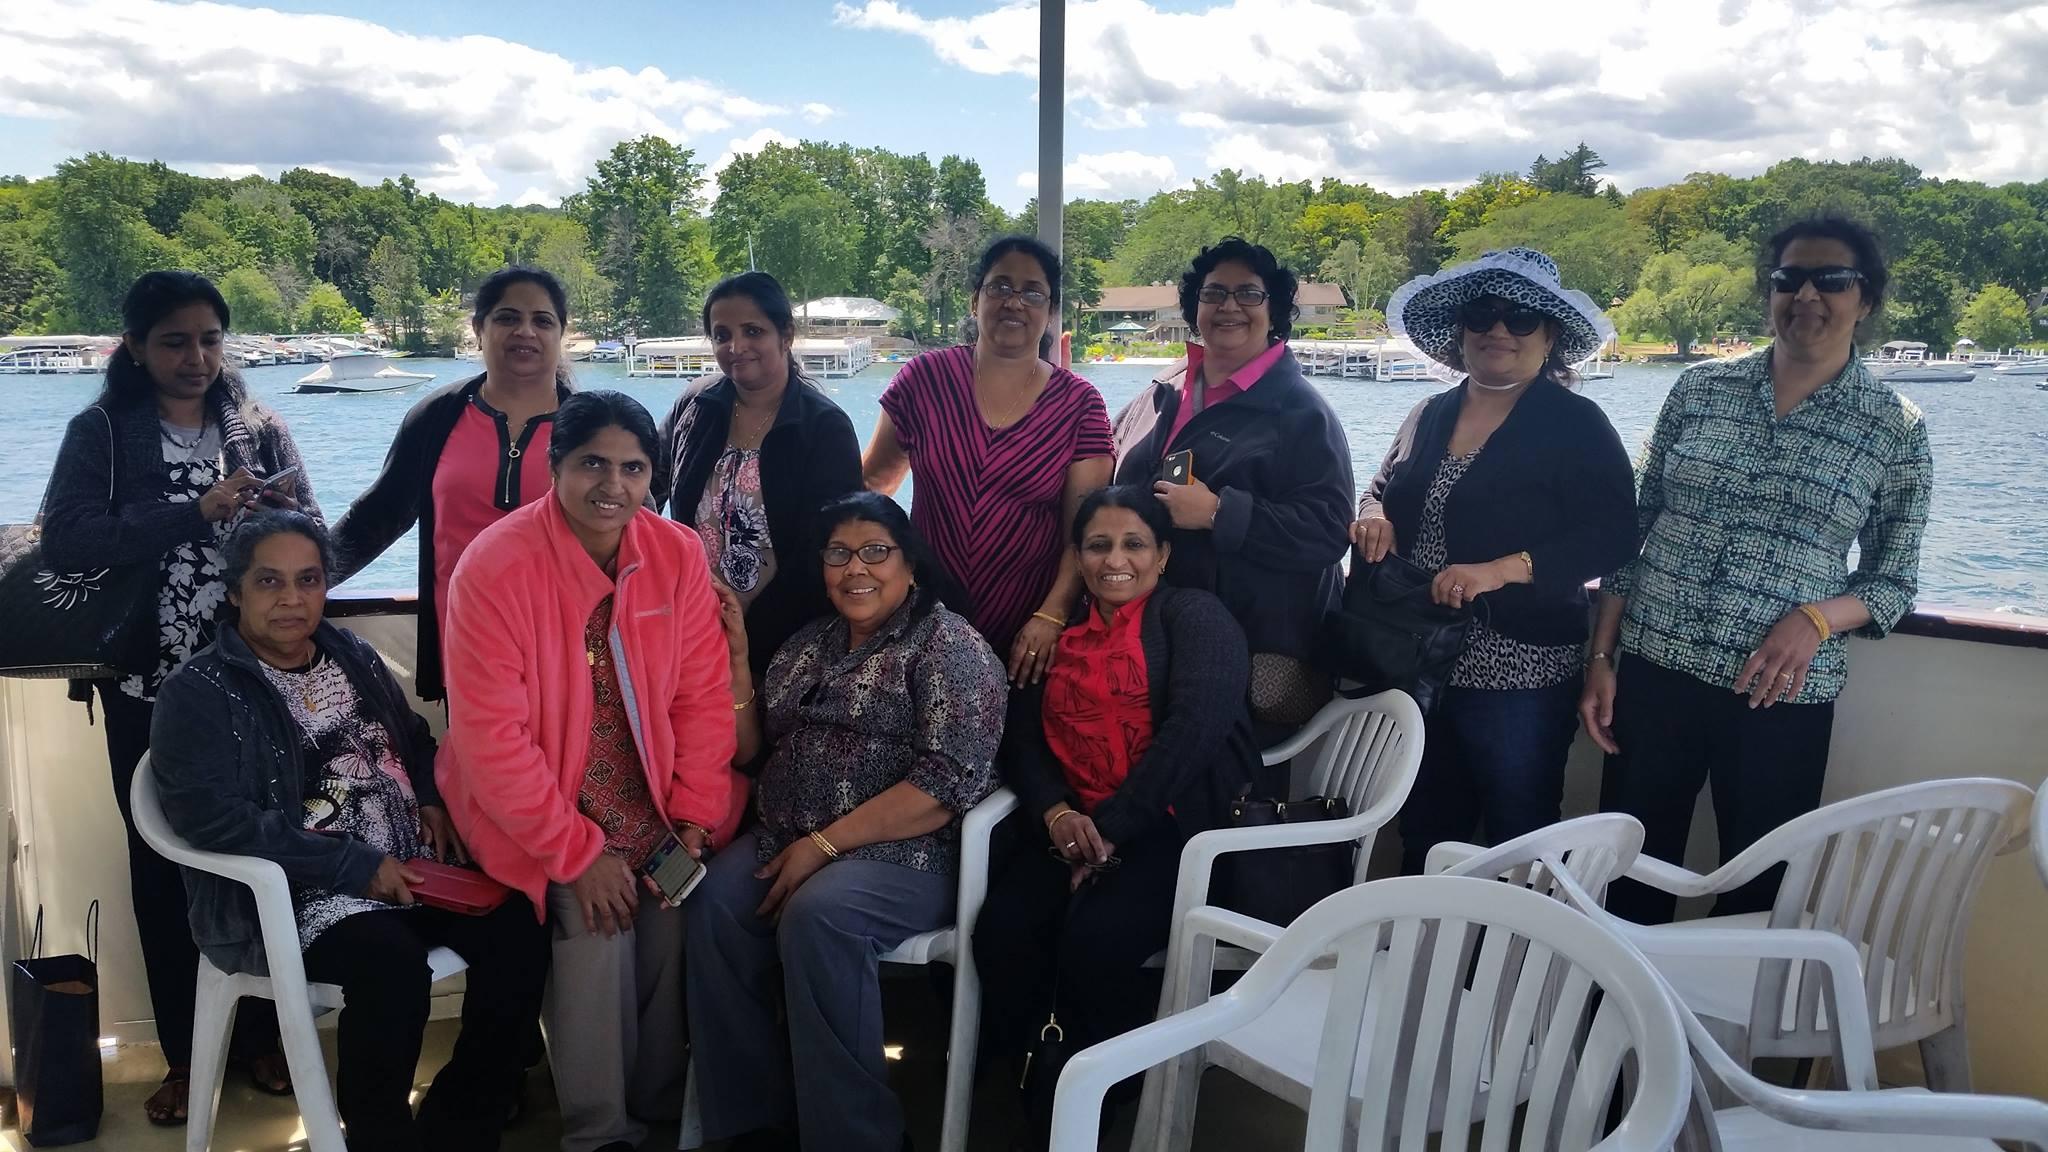 One day outing to Lake Geneva on Jun 24th, 2017